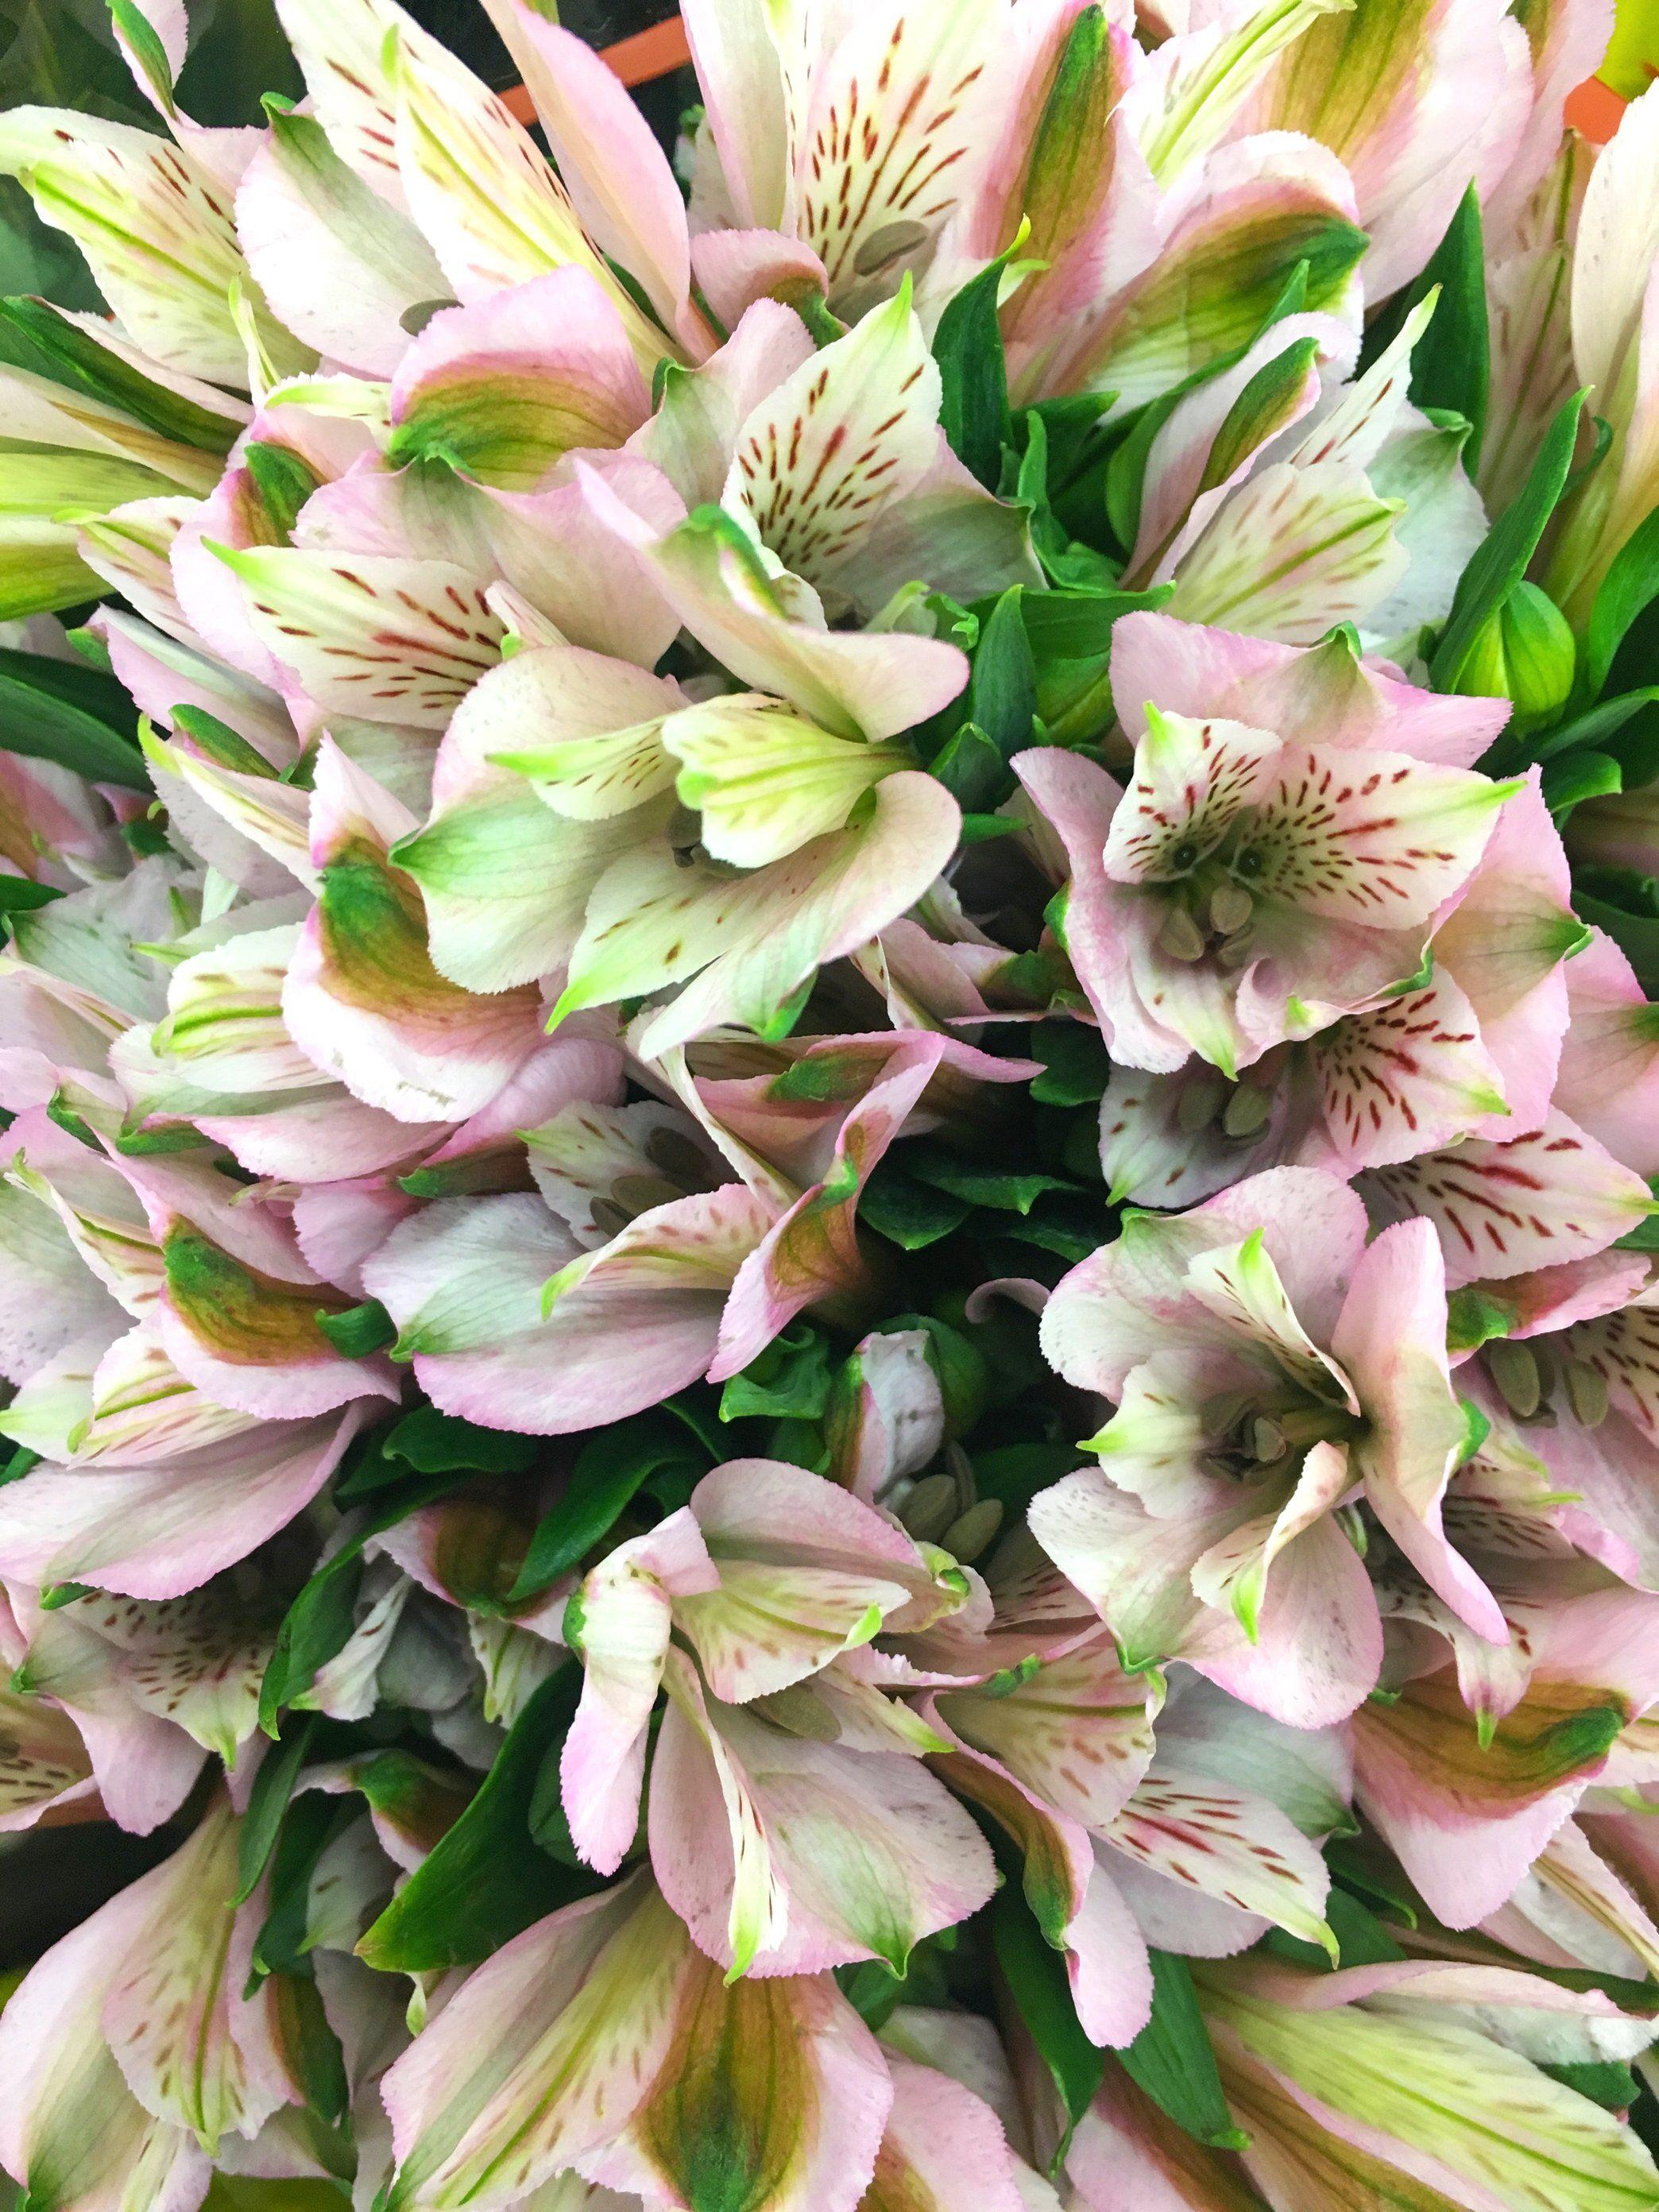 Alstroemeria Light Pink Diyflowers Diyweddingflowers Affordableflowers Weddingaffordable Doityo Alstroemeria Bouquet Alstroemeria Flower Bouquet Wedding